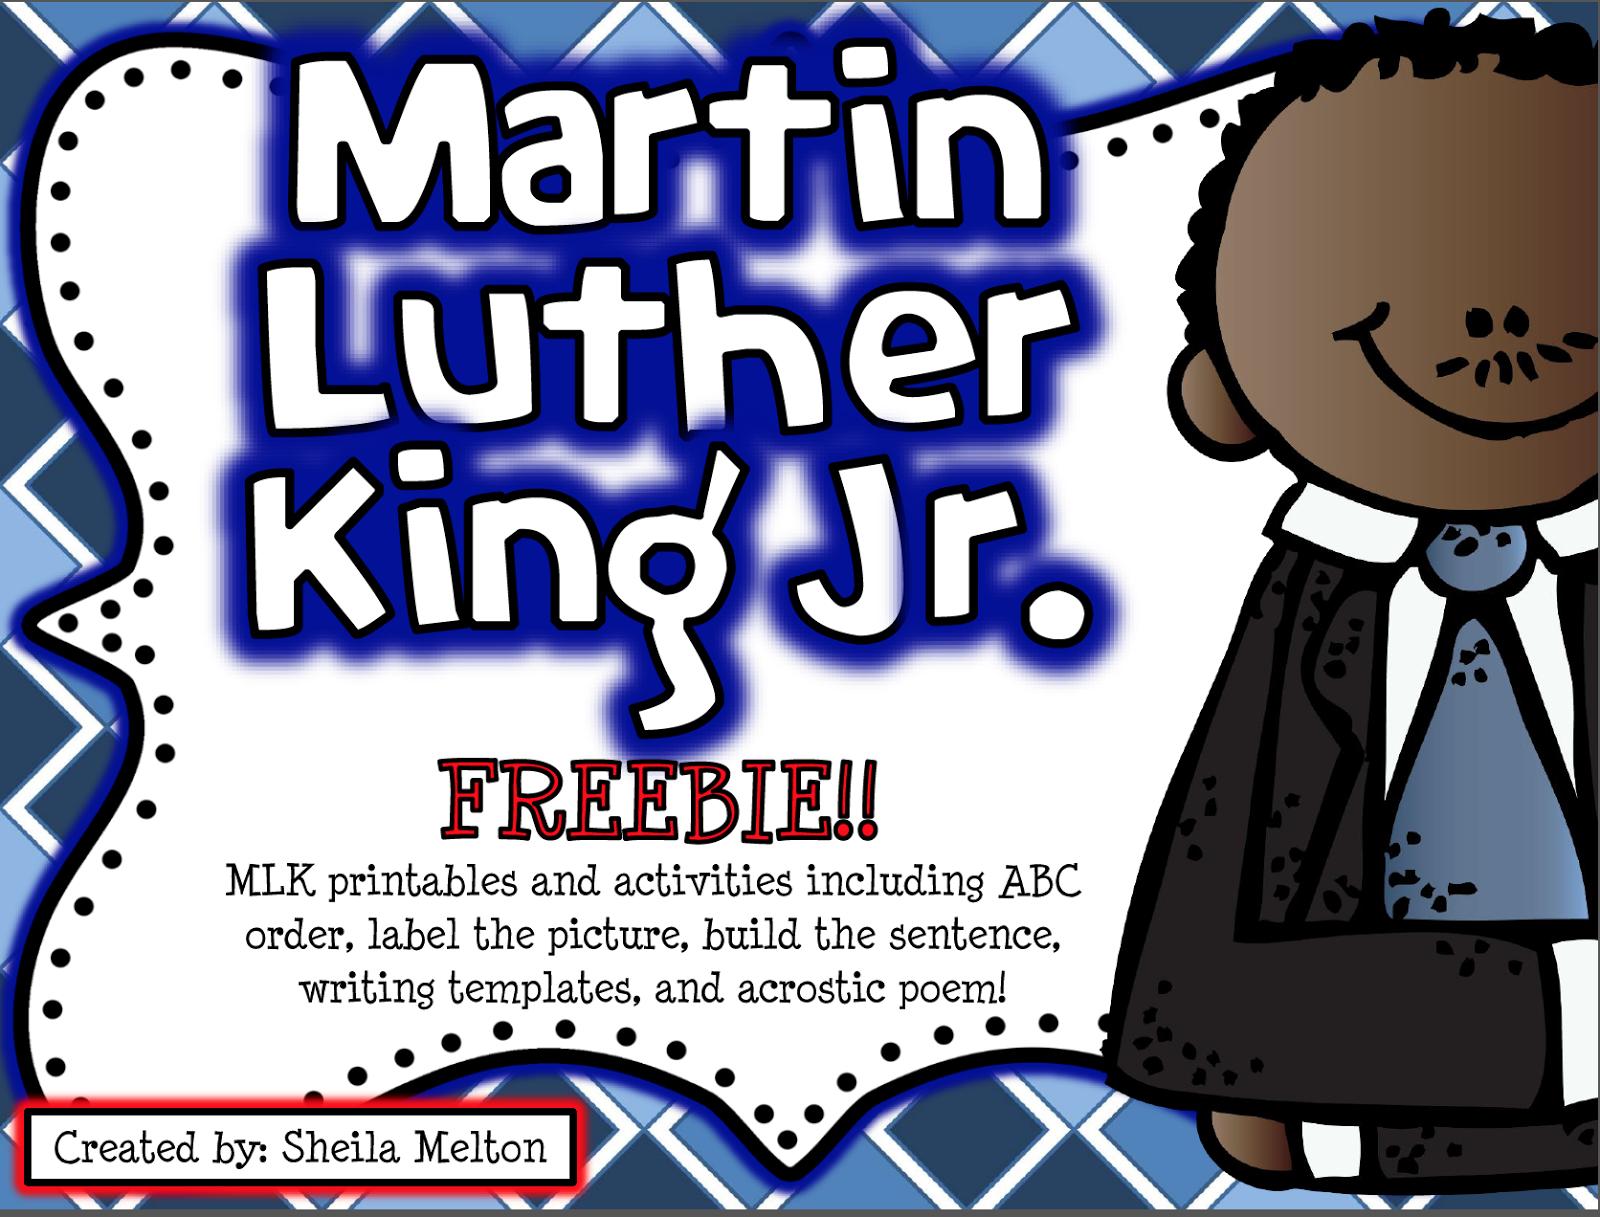 Martin Luther King Jr Worksheet For First Grade